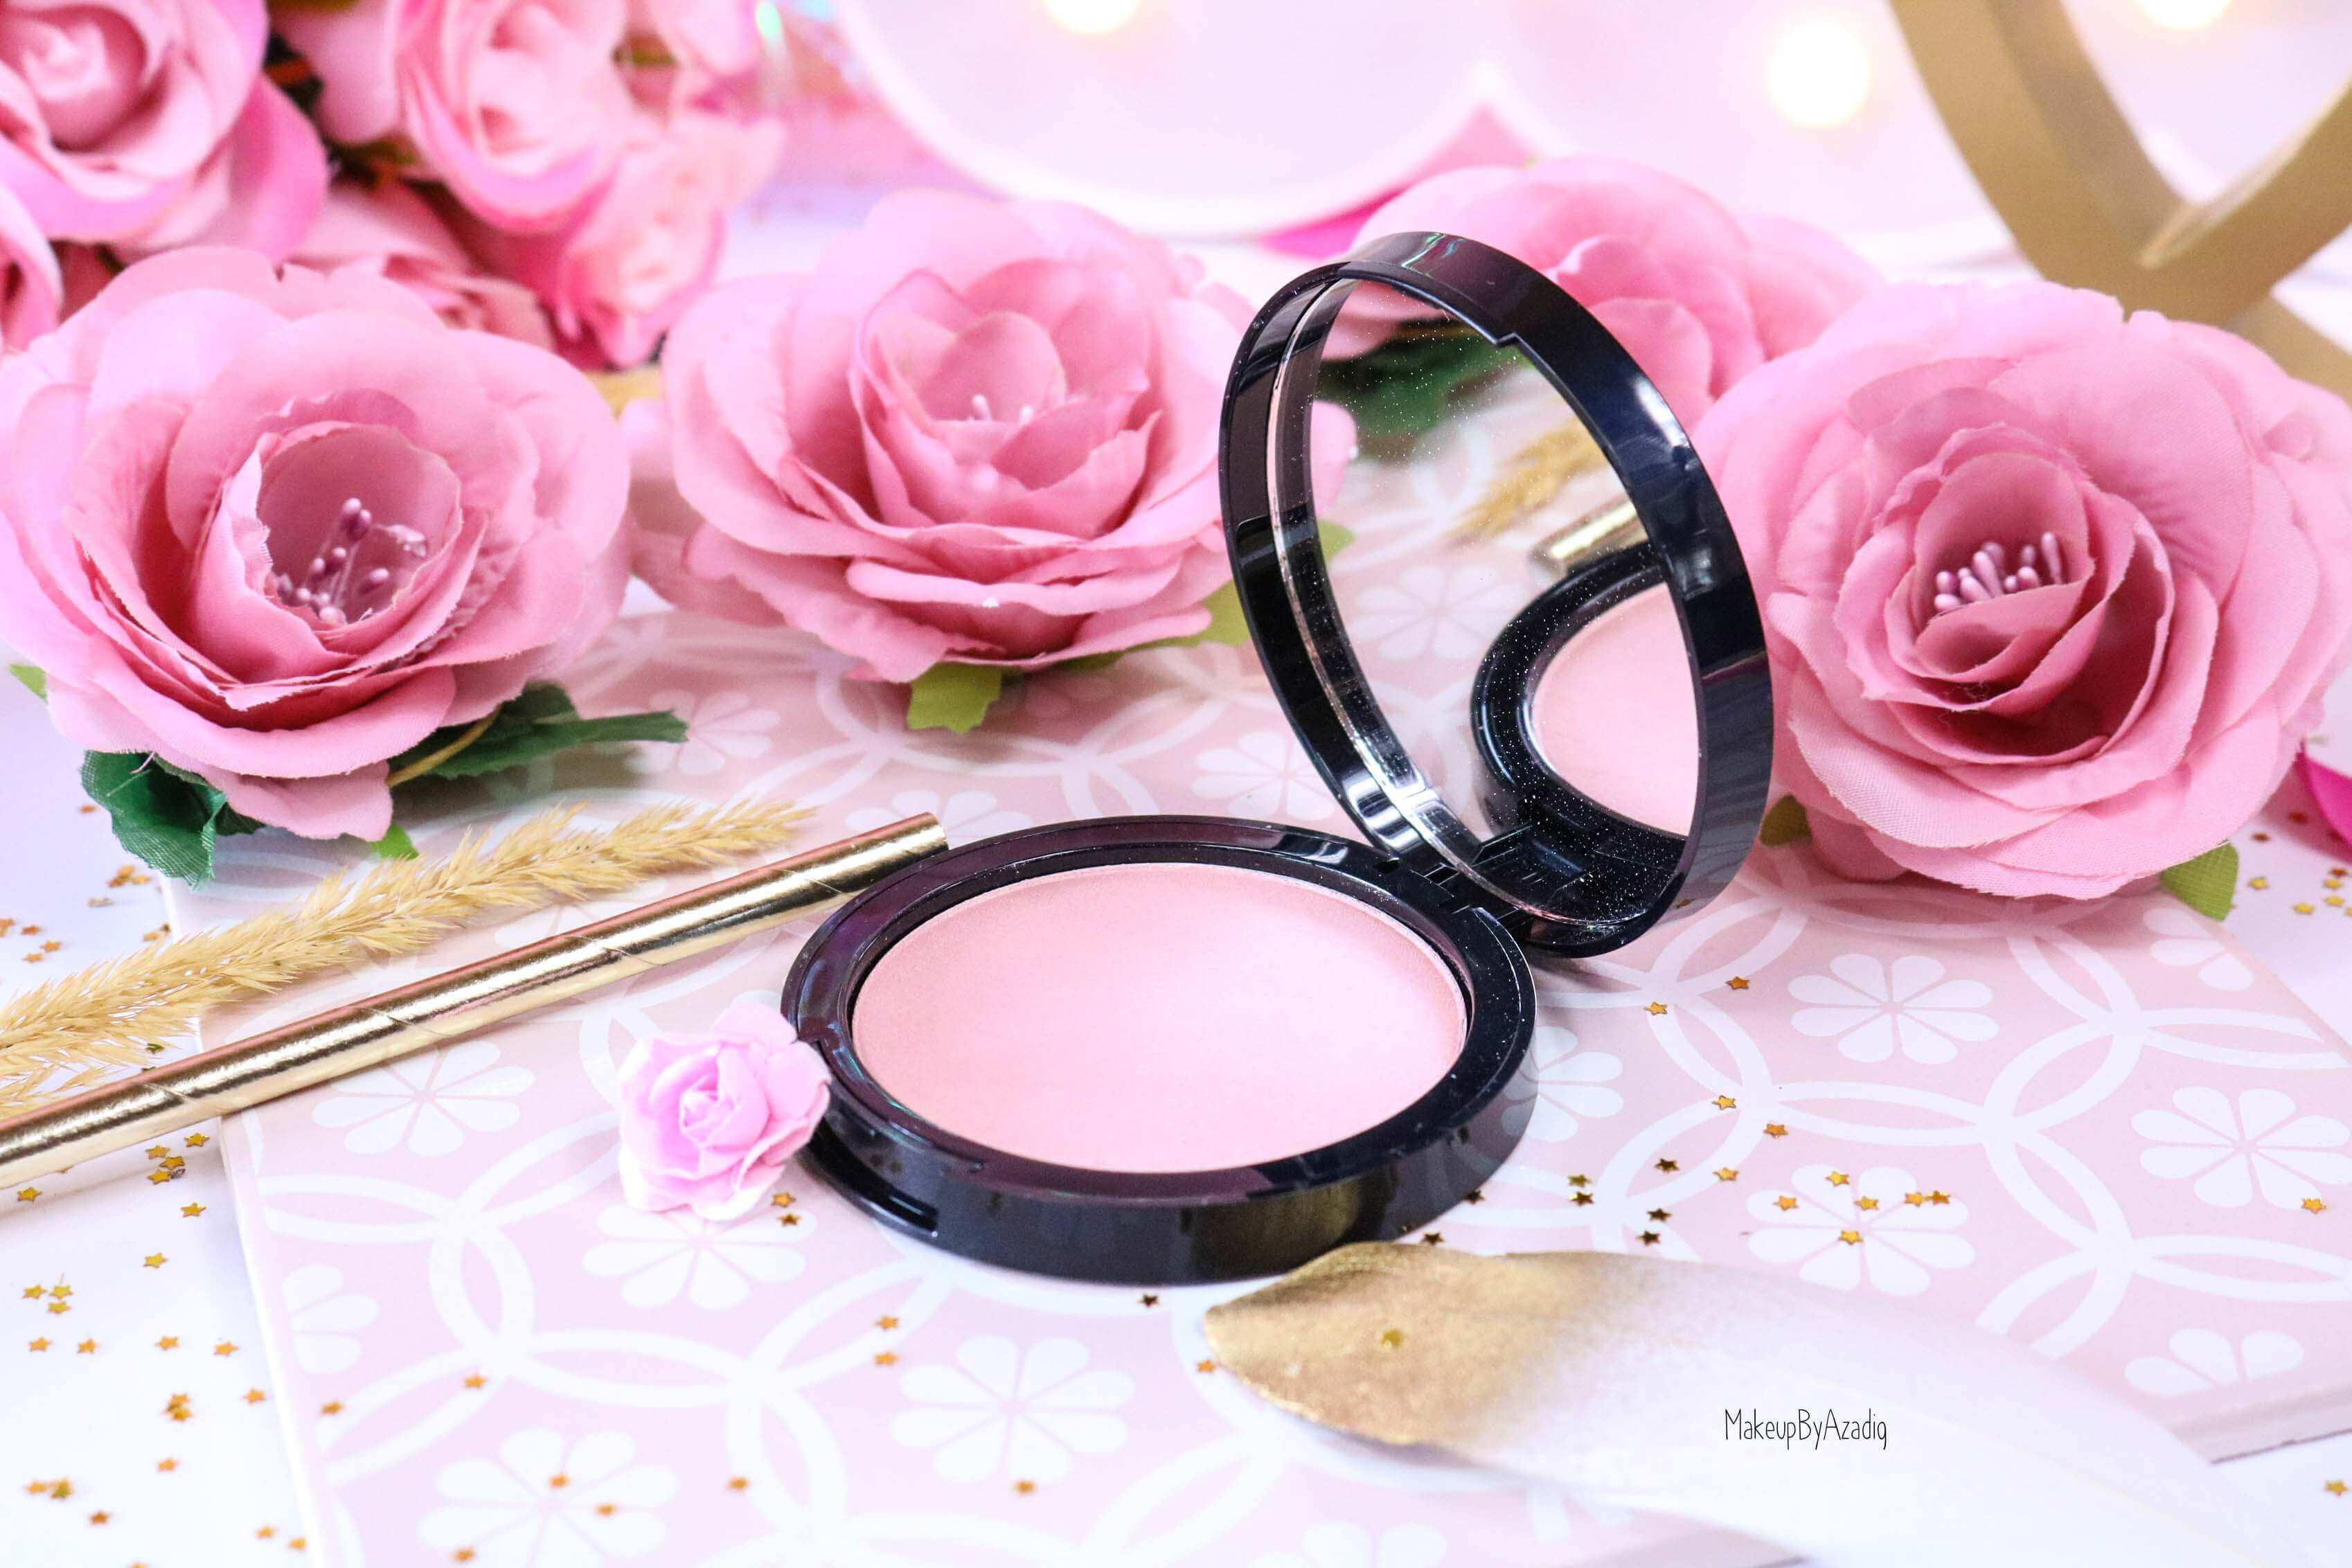 revue-highlighter-poudre-illuminatrice-golden-hour-dusk-sephora-collection-rosegold-avis-prix-swatch-makeupbyazadig-pink